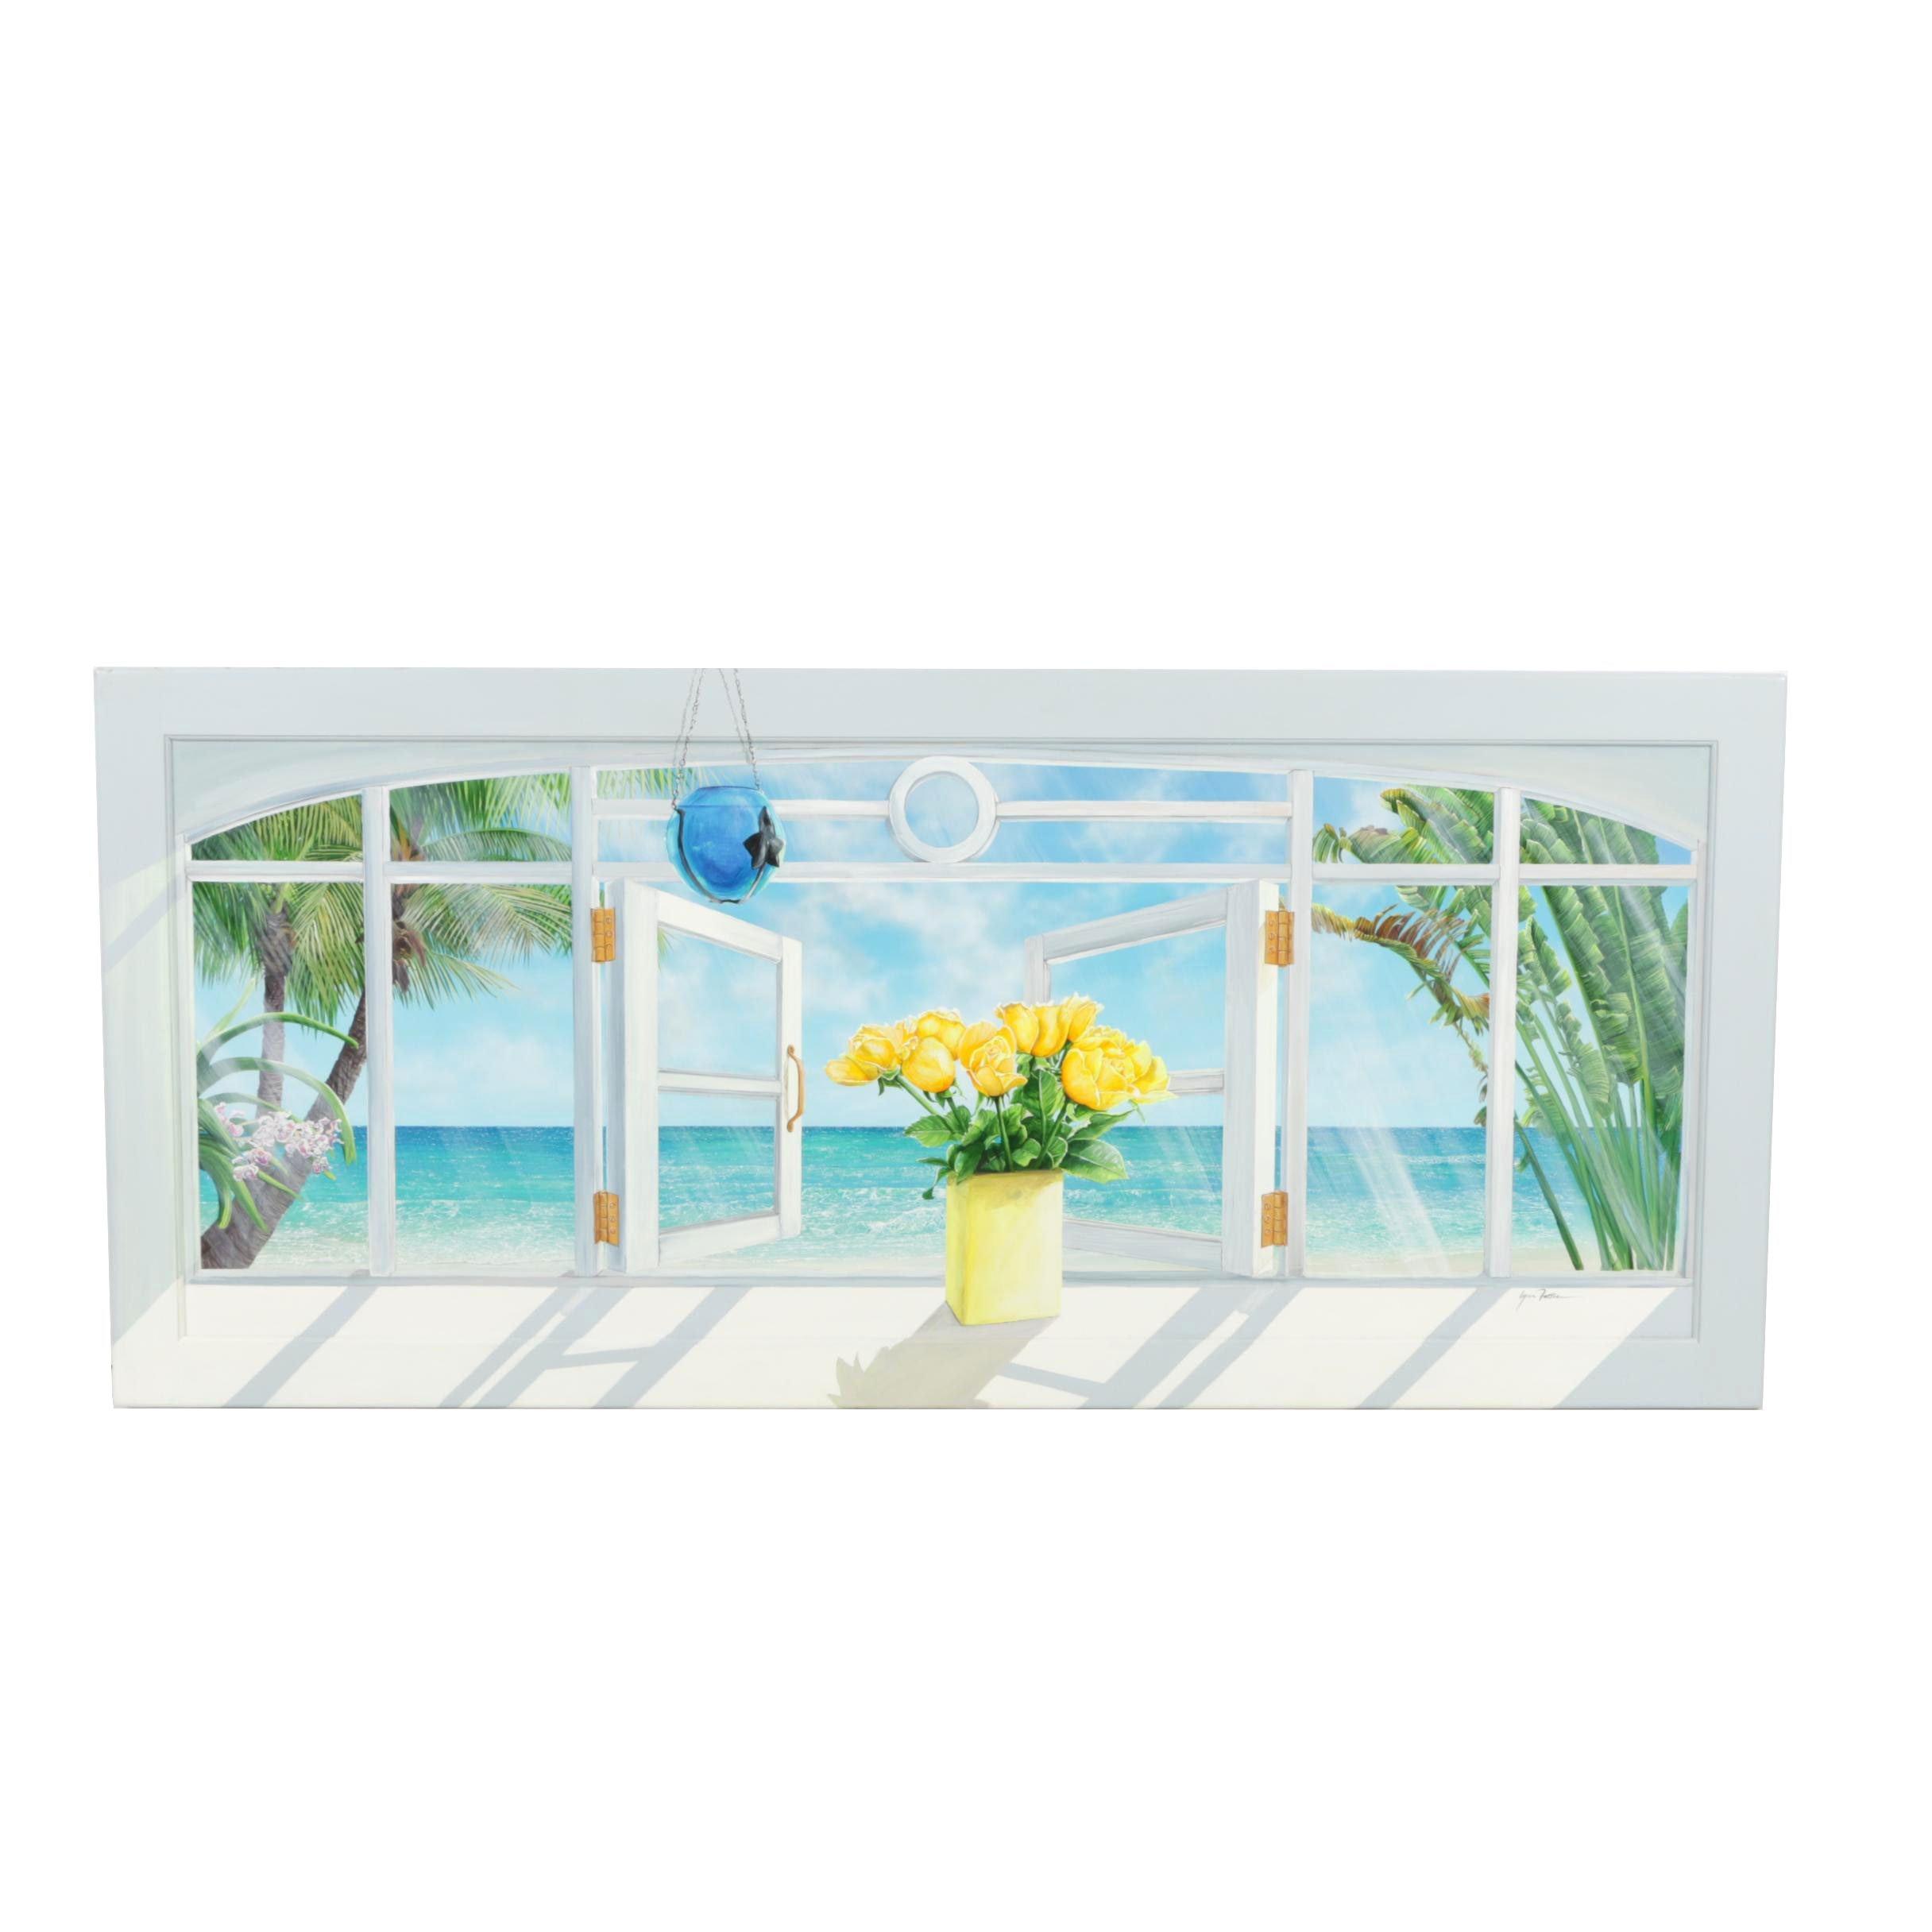 Lynn Fecteau Original Oil Painting of Window View